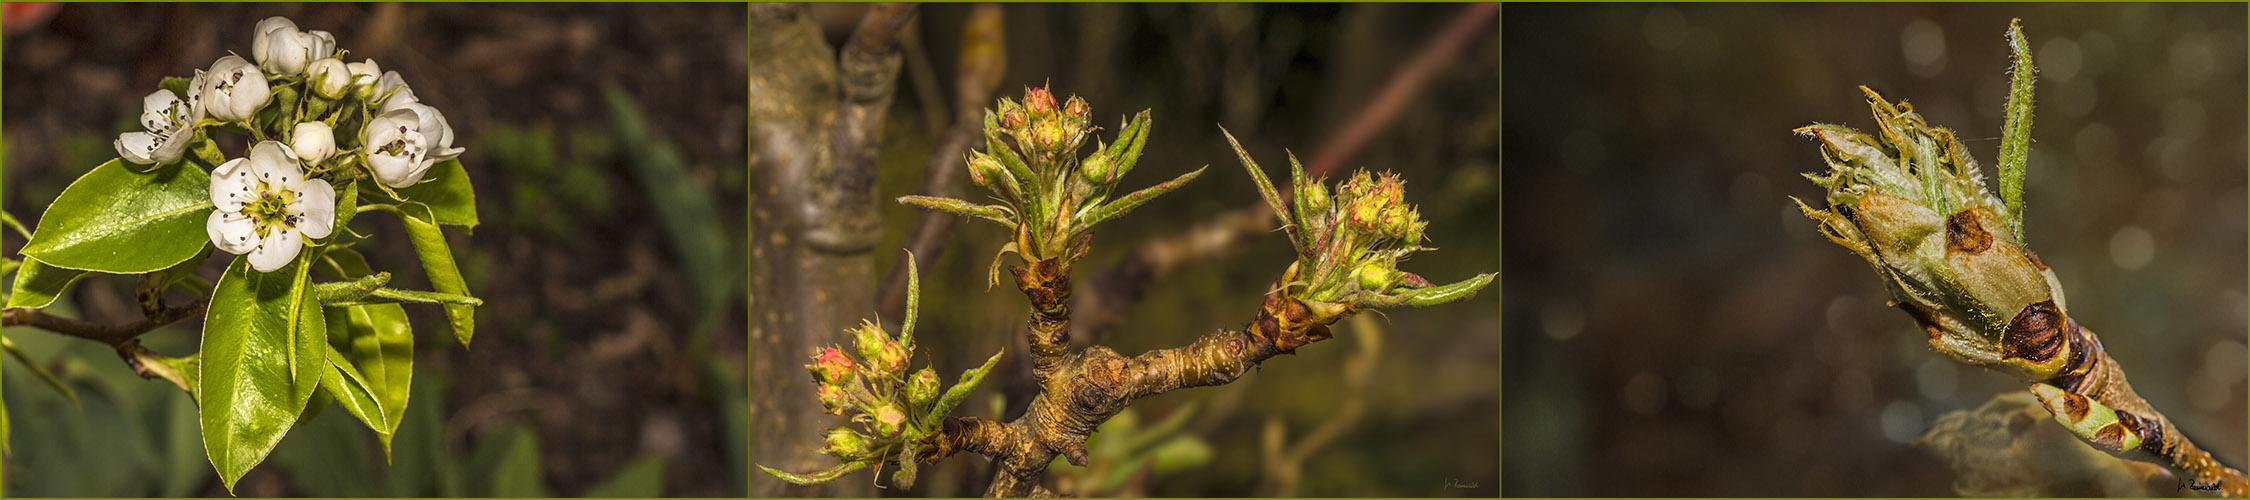 Birnenblütenknospenpano